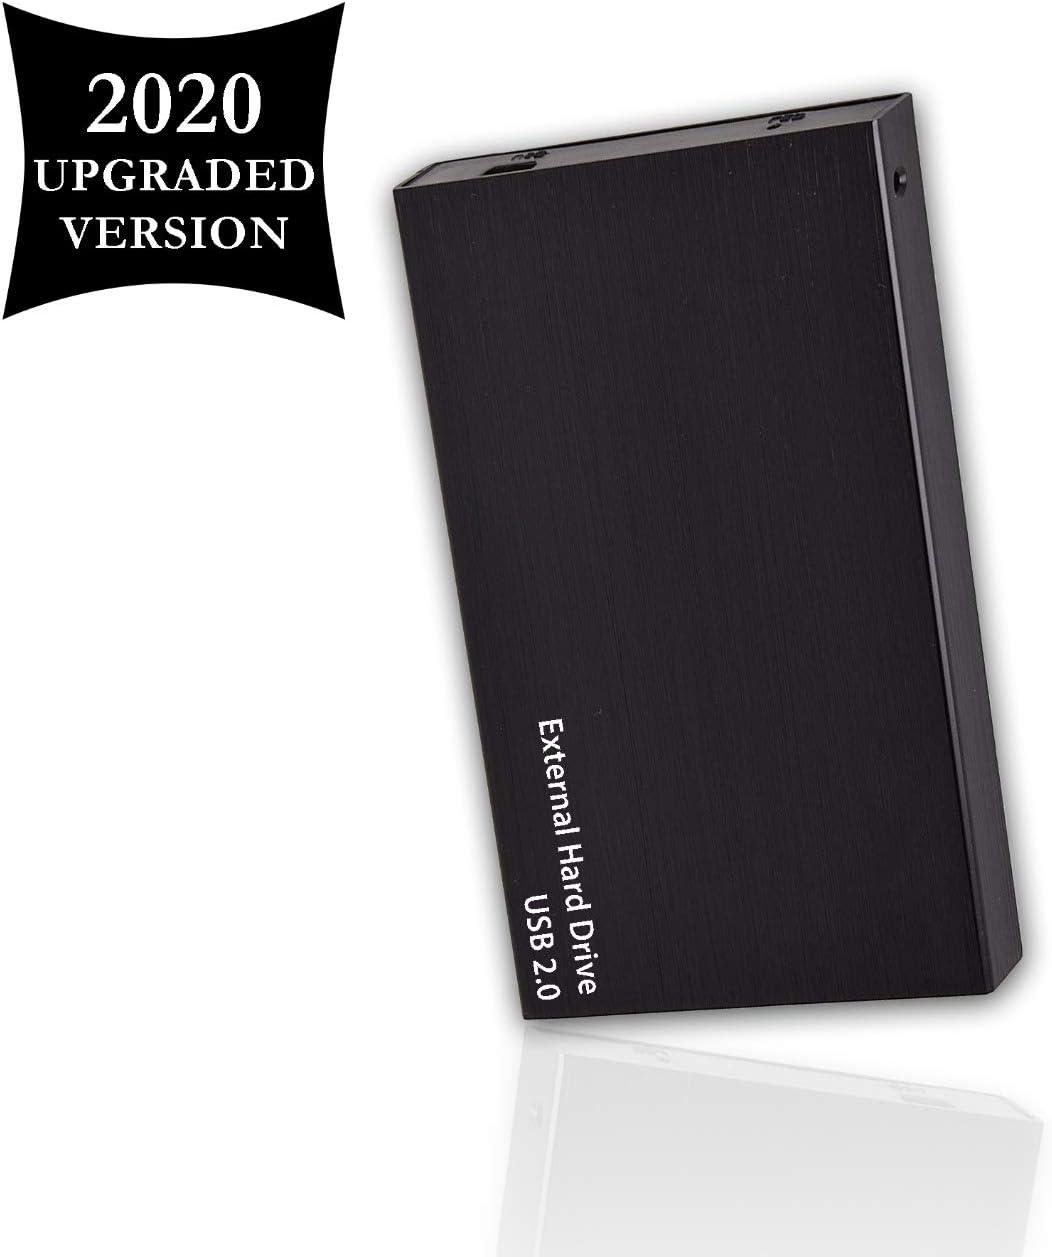 "Portable External Hard Drive, USB 2.0, 2.5"" Slim External Hard Drive Plug and Play Hardrive for Storage, Backup for Computer, MAC, Desktop, Laptop, MacBook, Chromebeook (200GB, Black)"